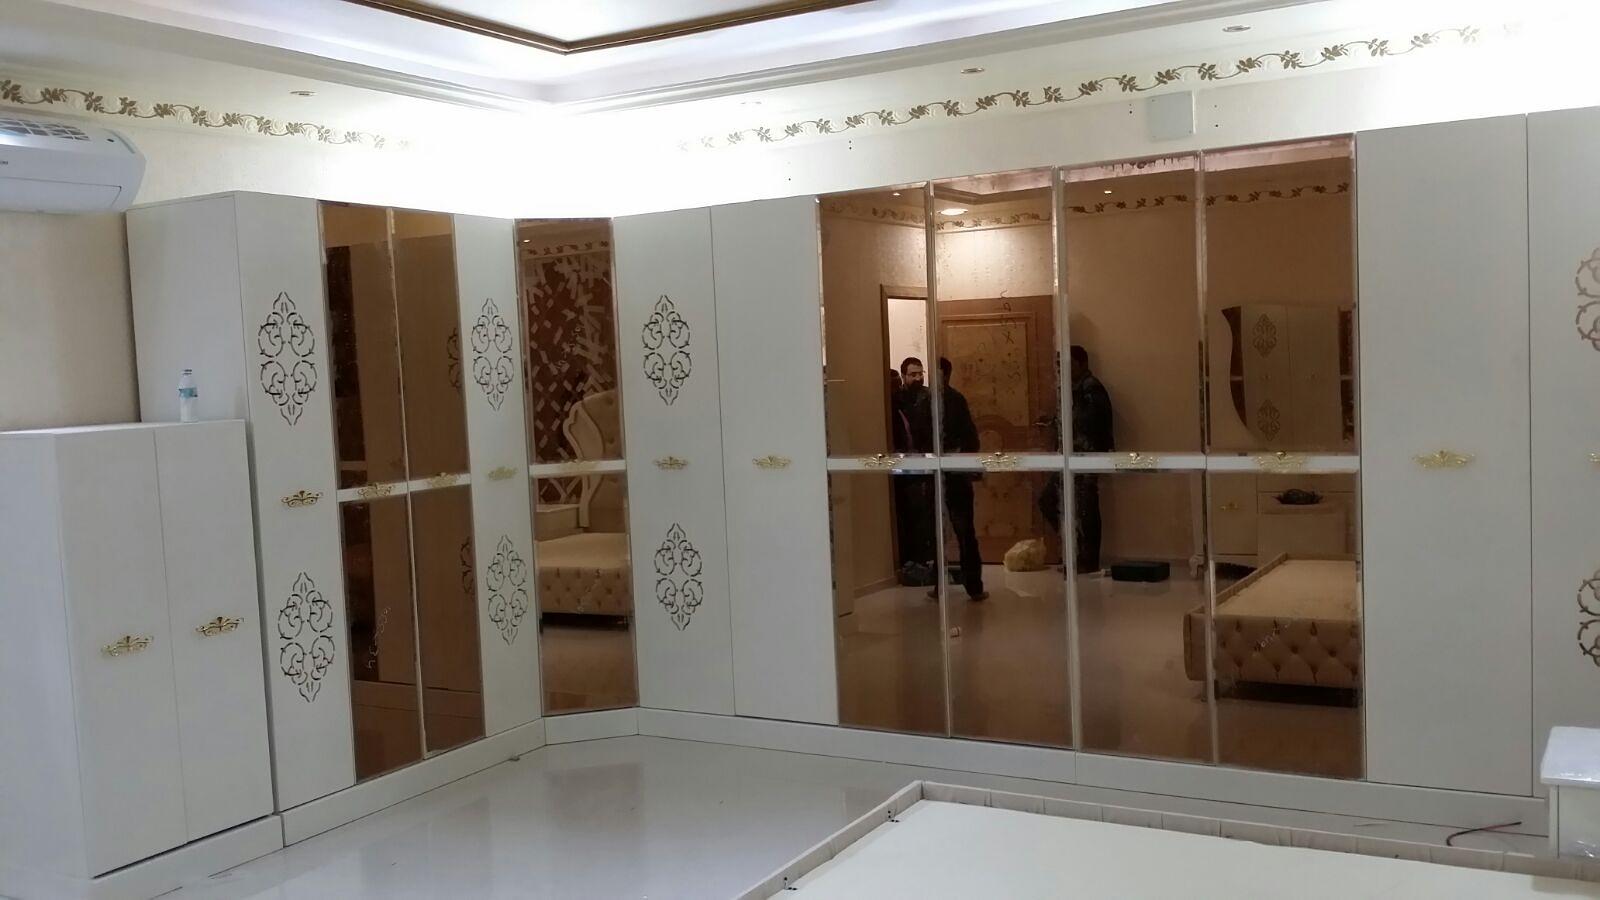 ميمون للأثاث | Memon Furniture: اجمل محل تفصيل غرف نوم بالرياض